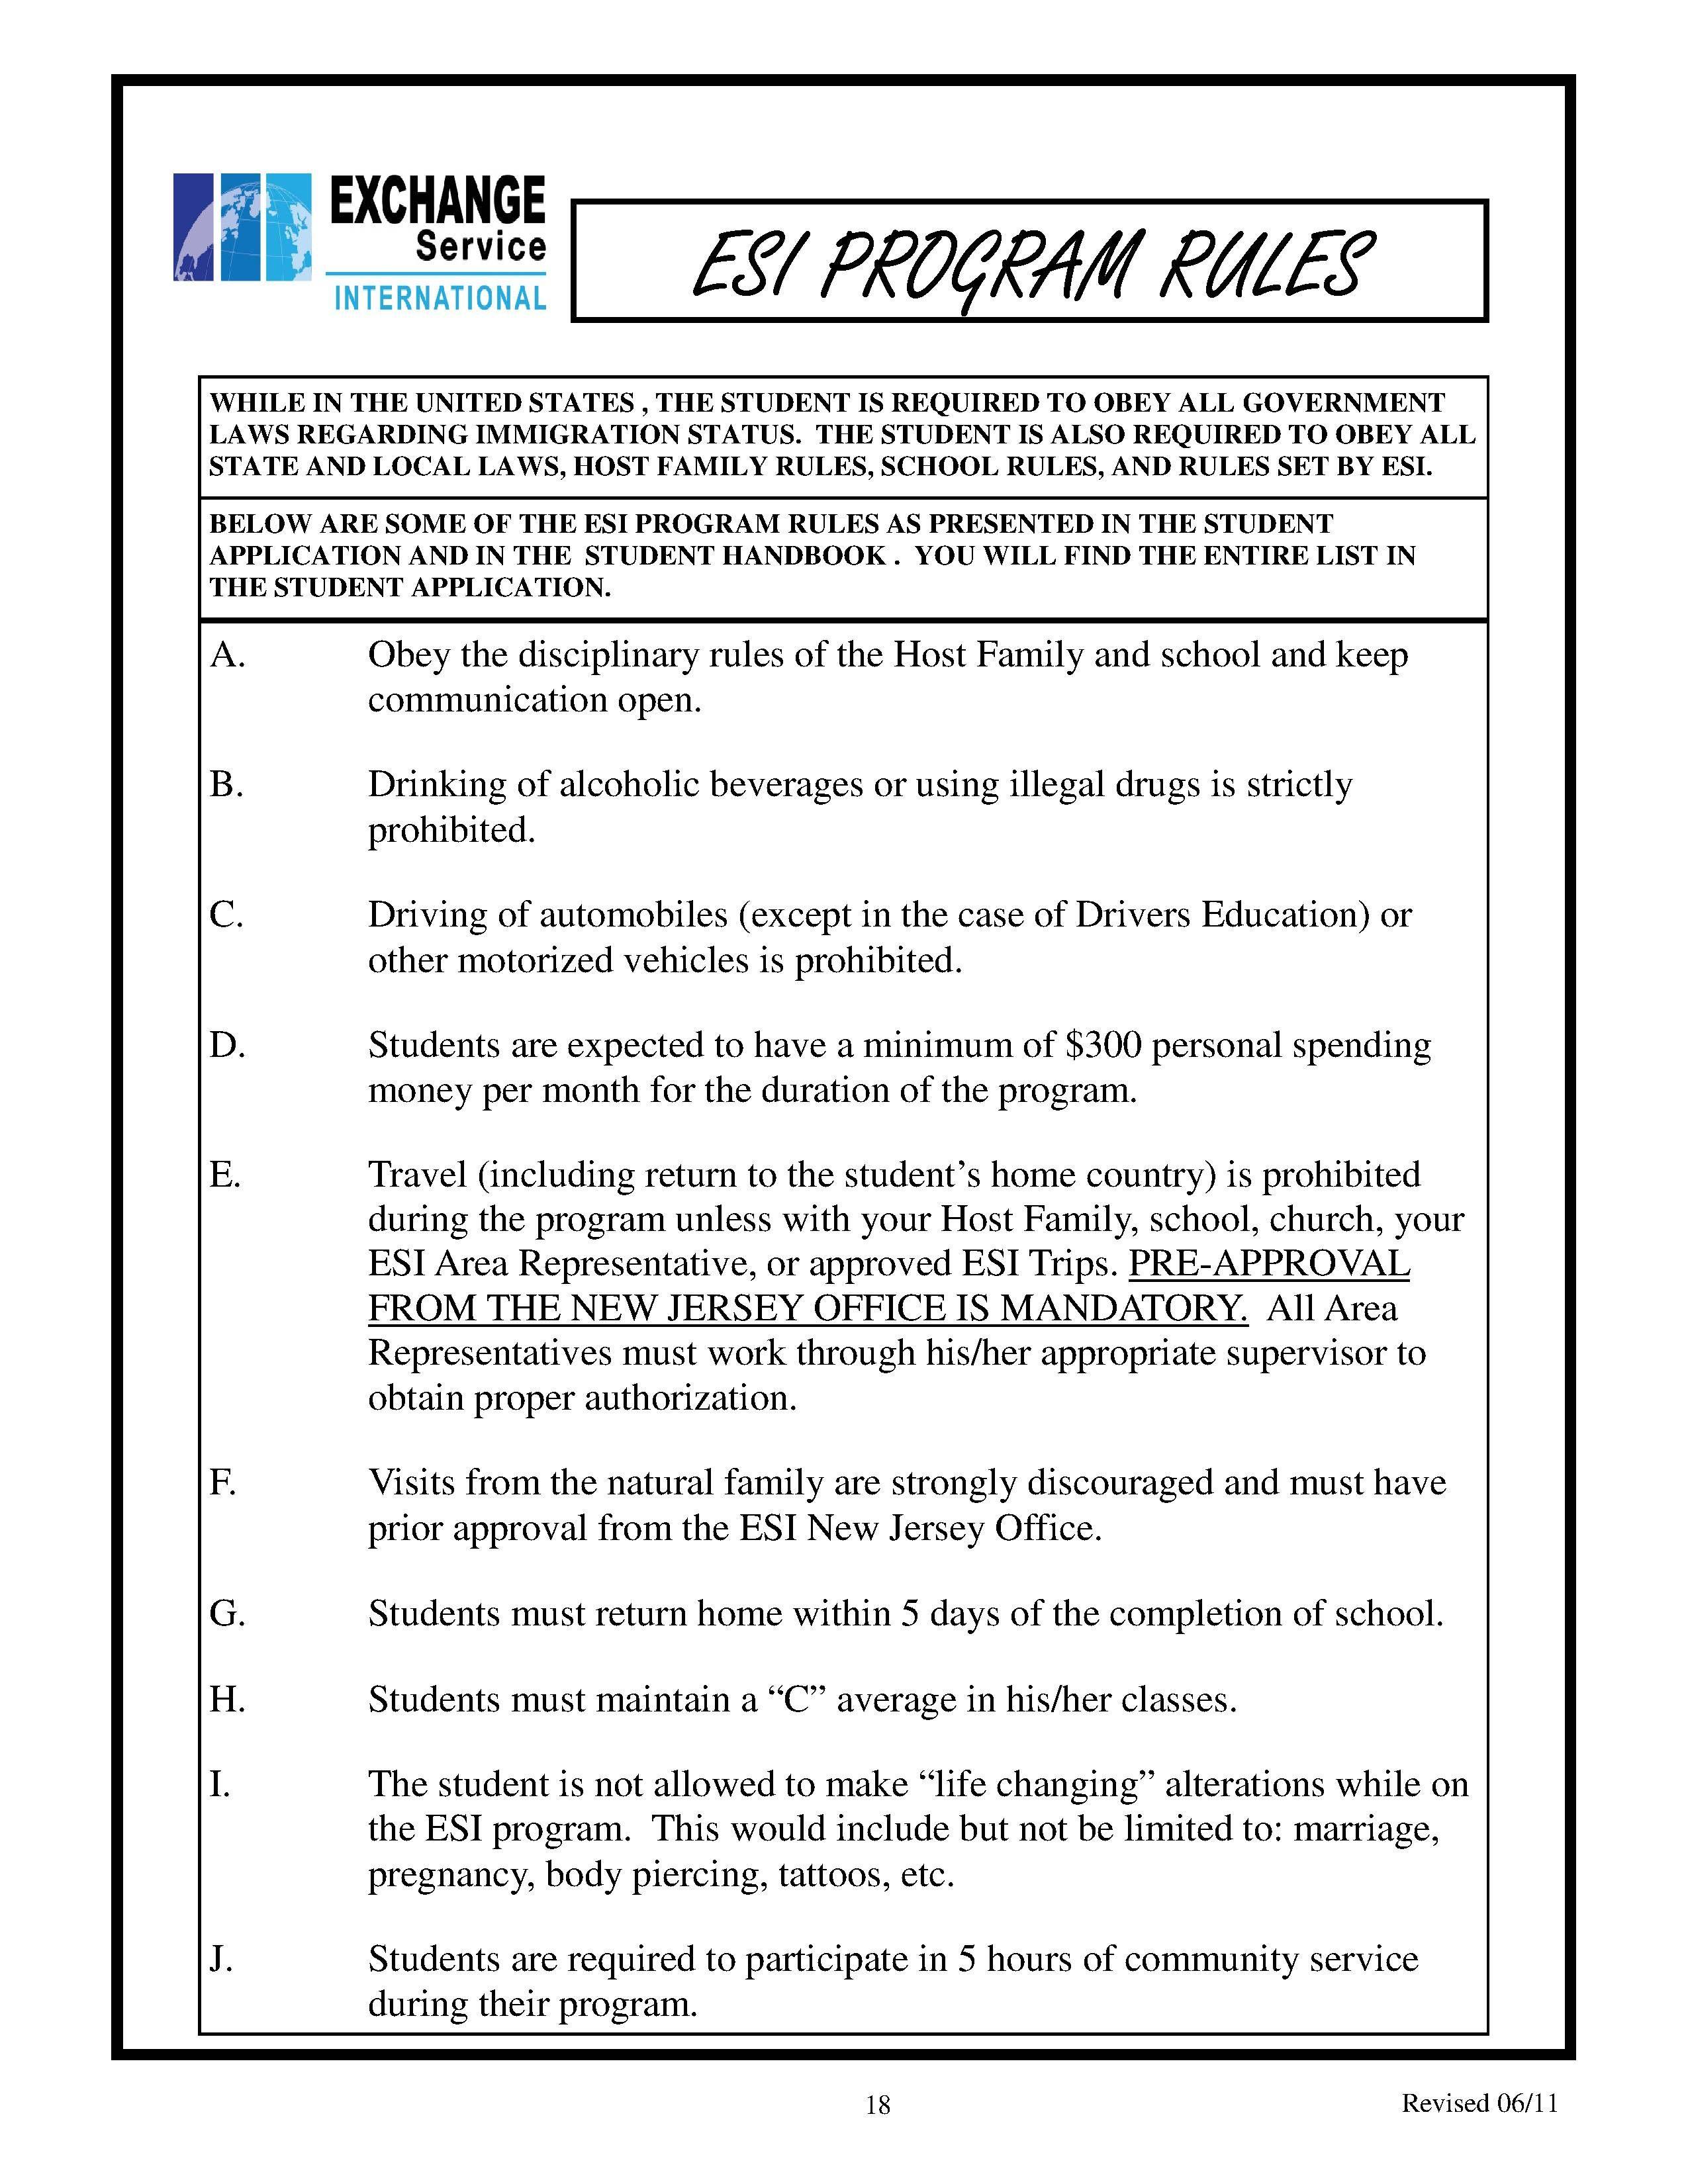 esi service user guide car owners manual u2022 rh karenhanover co